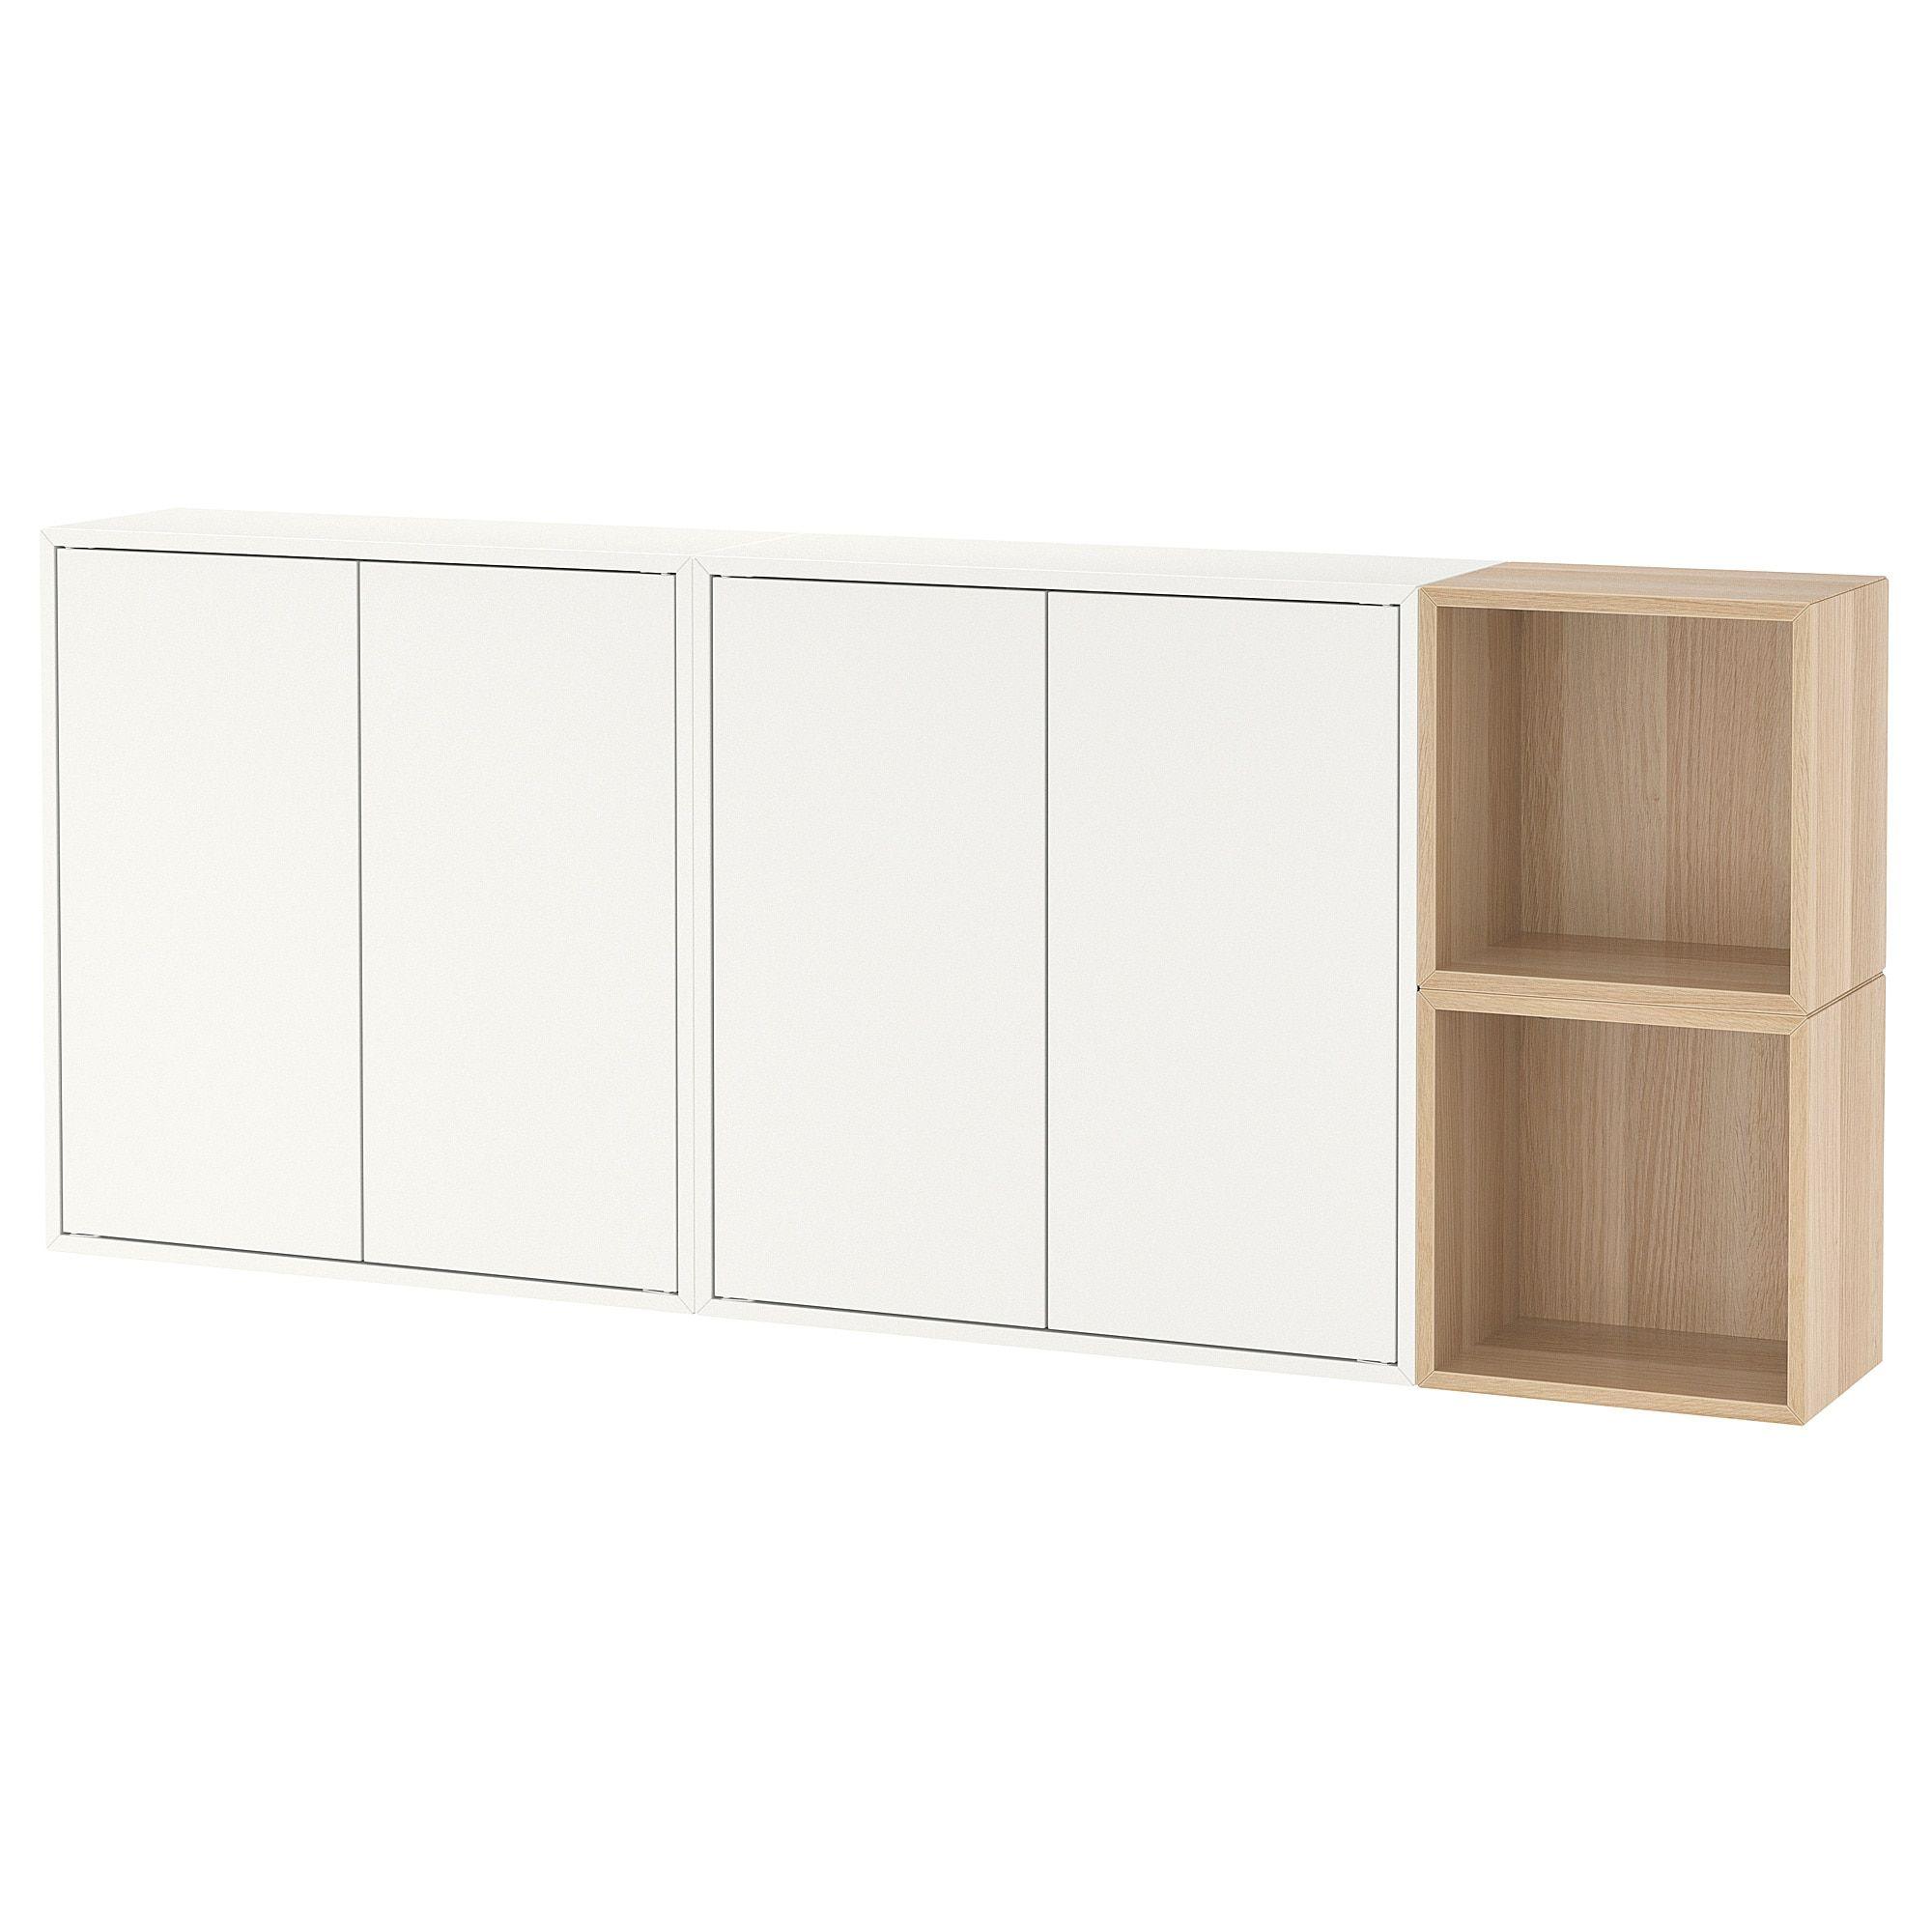 Ikea Eket Agencement Rangement Mural Blanc Effet Chêne